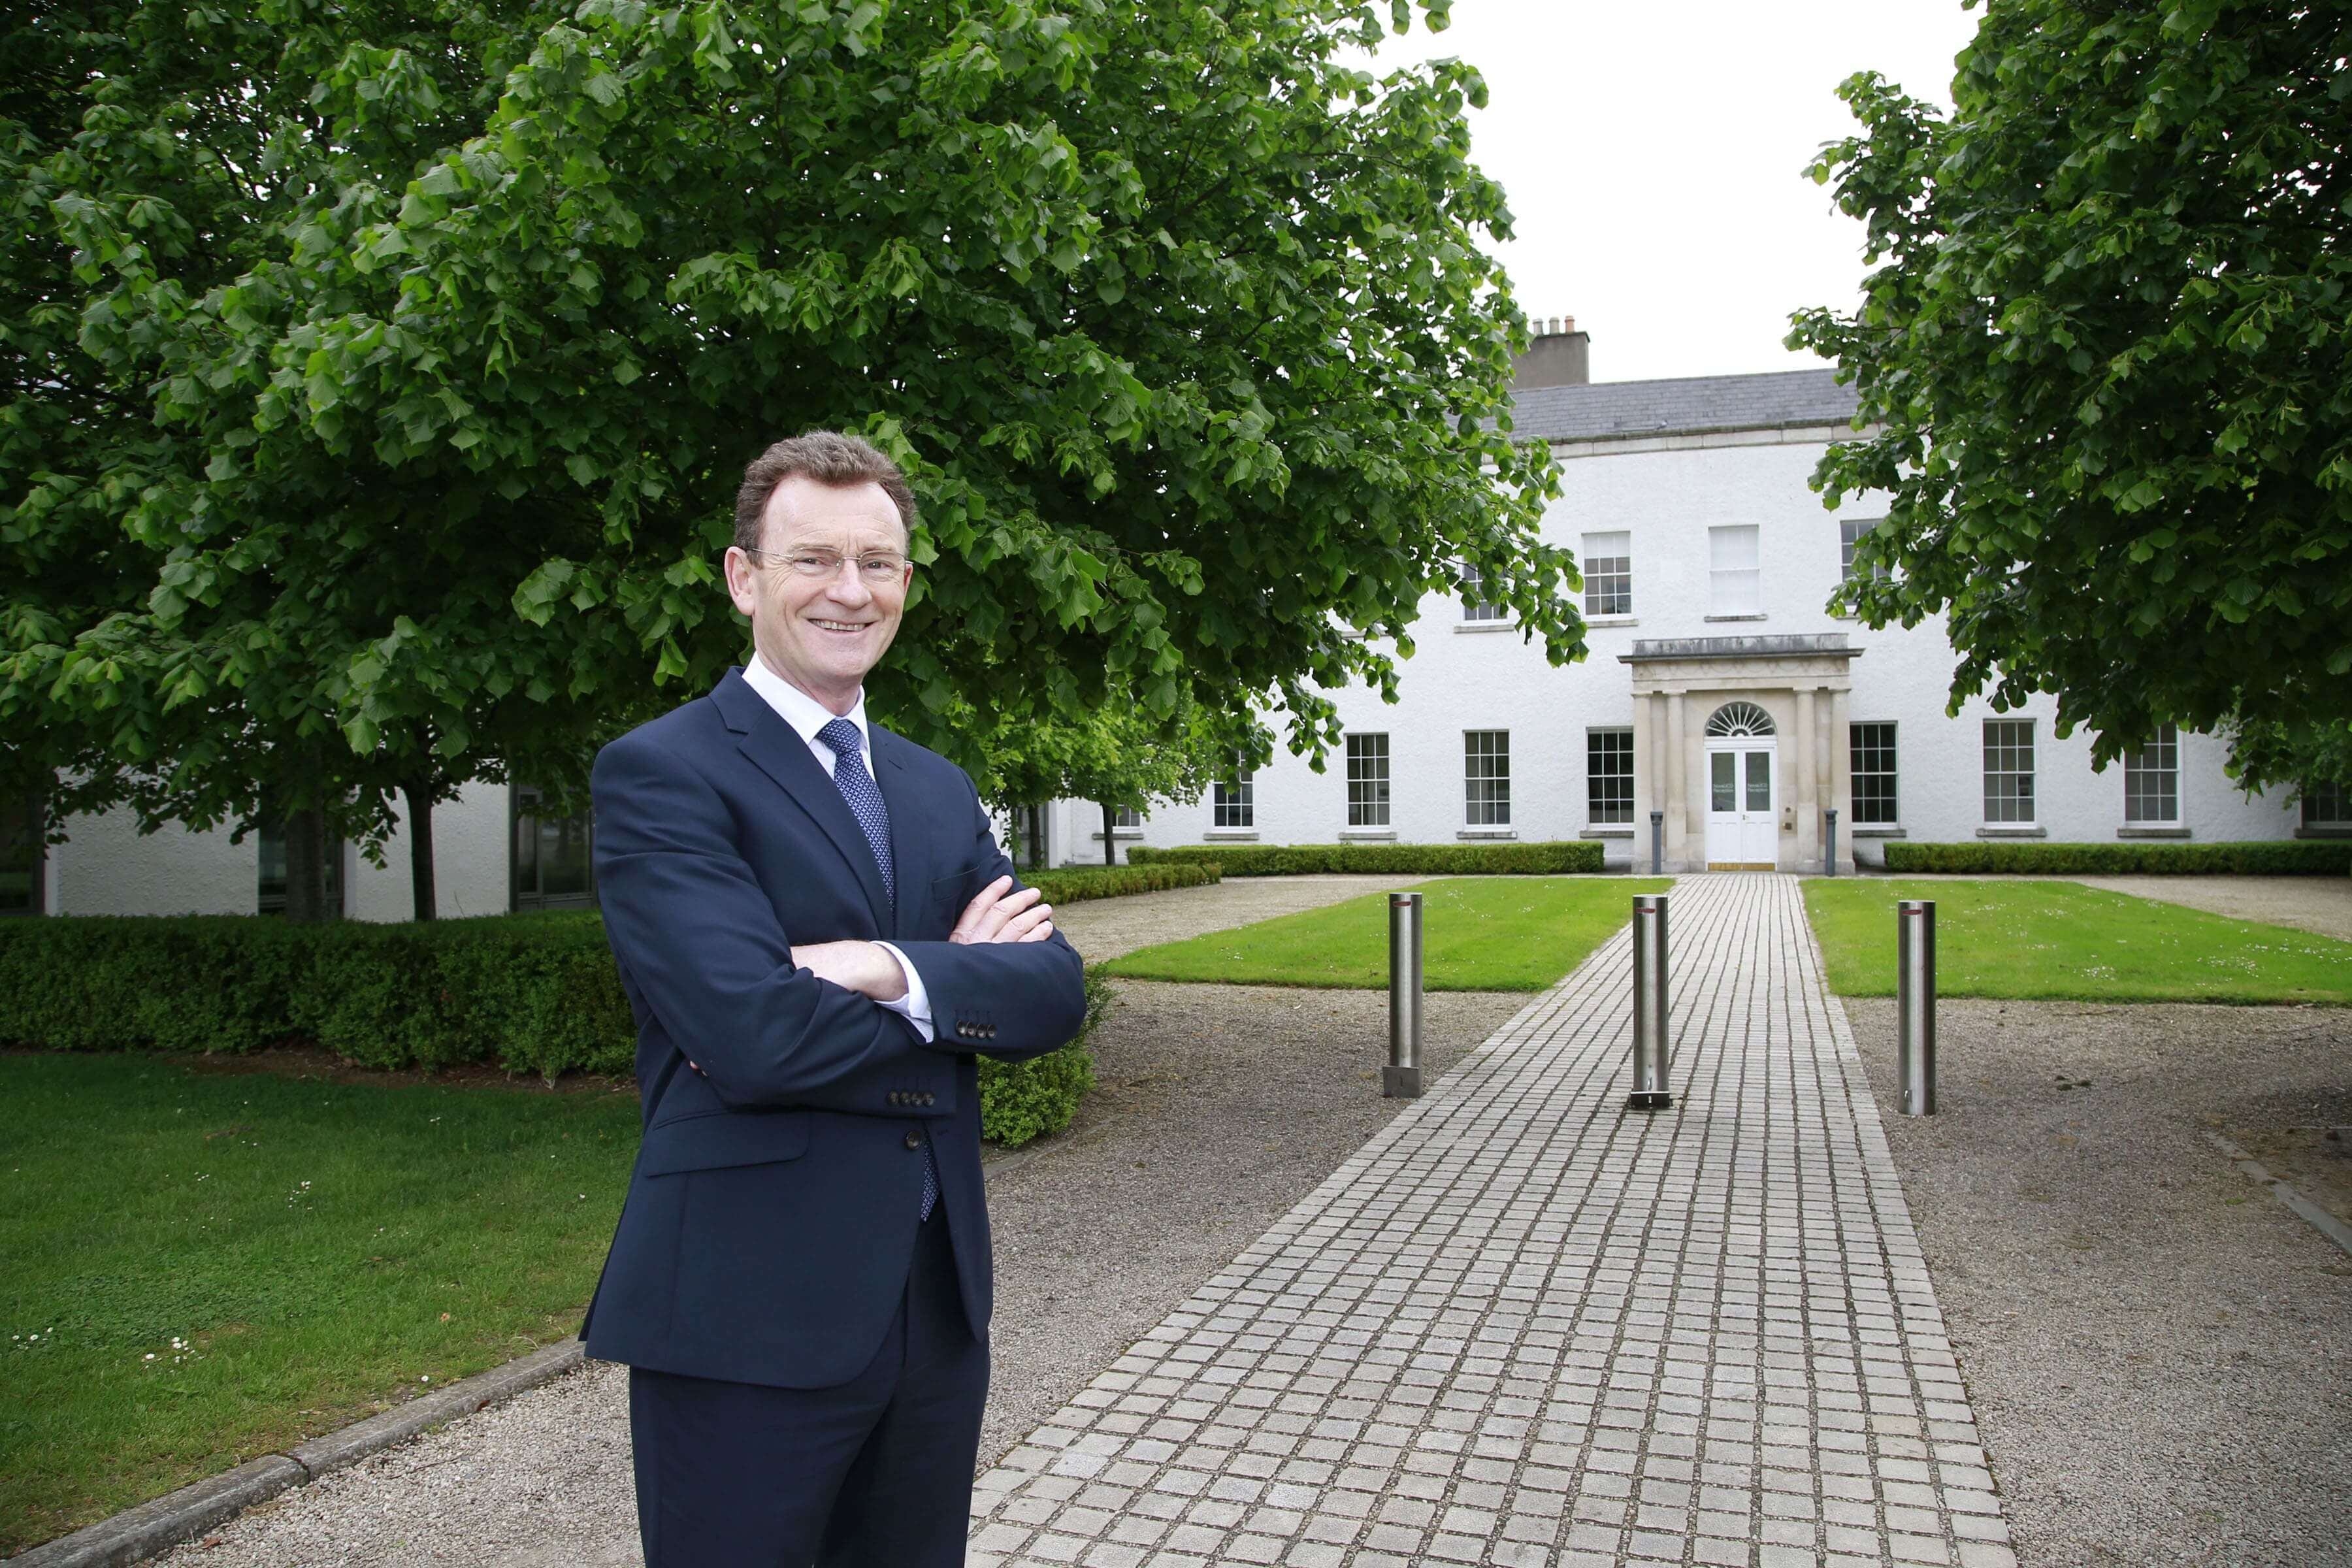 Incubating innovation: How Ireland nurtures the future